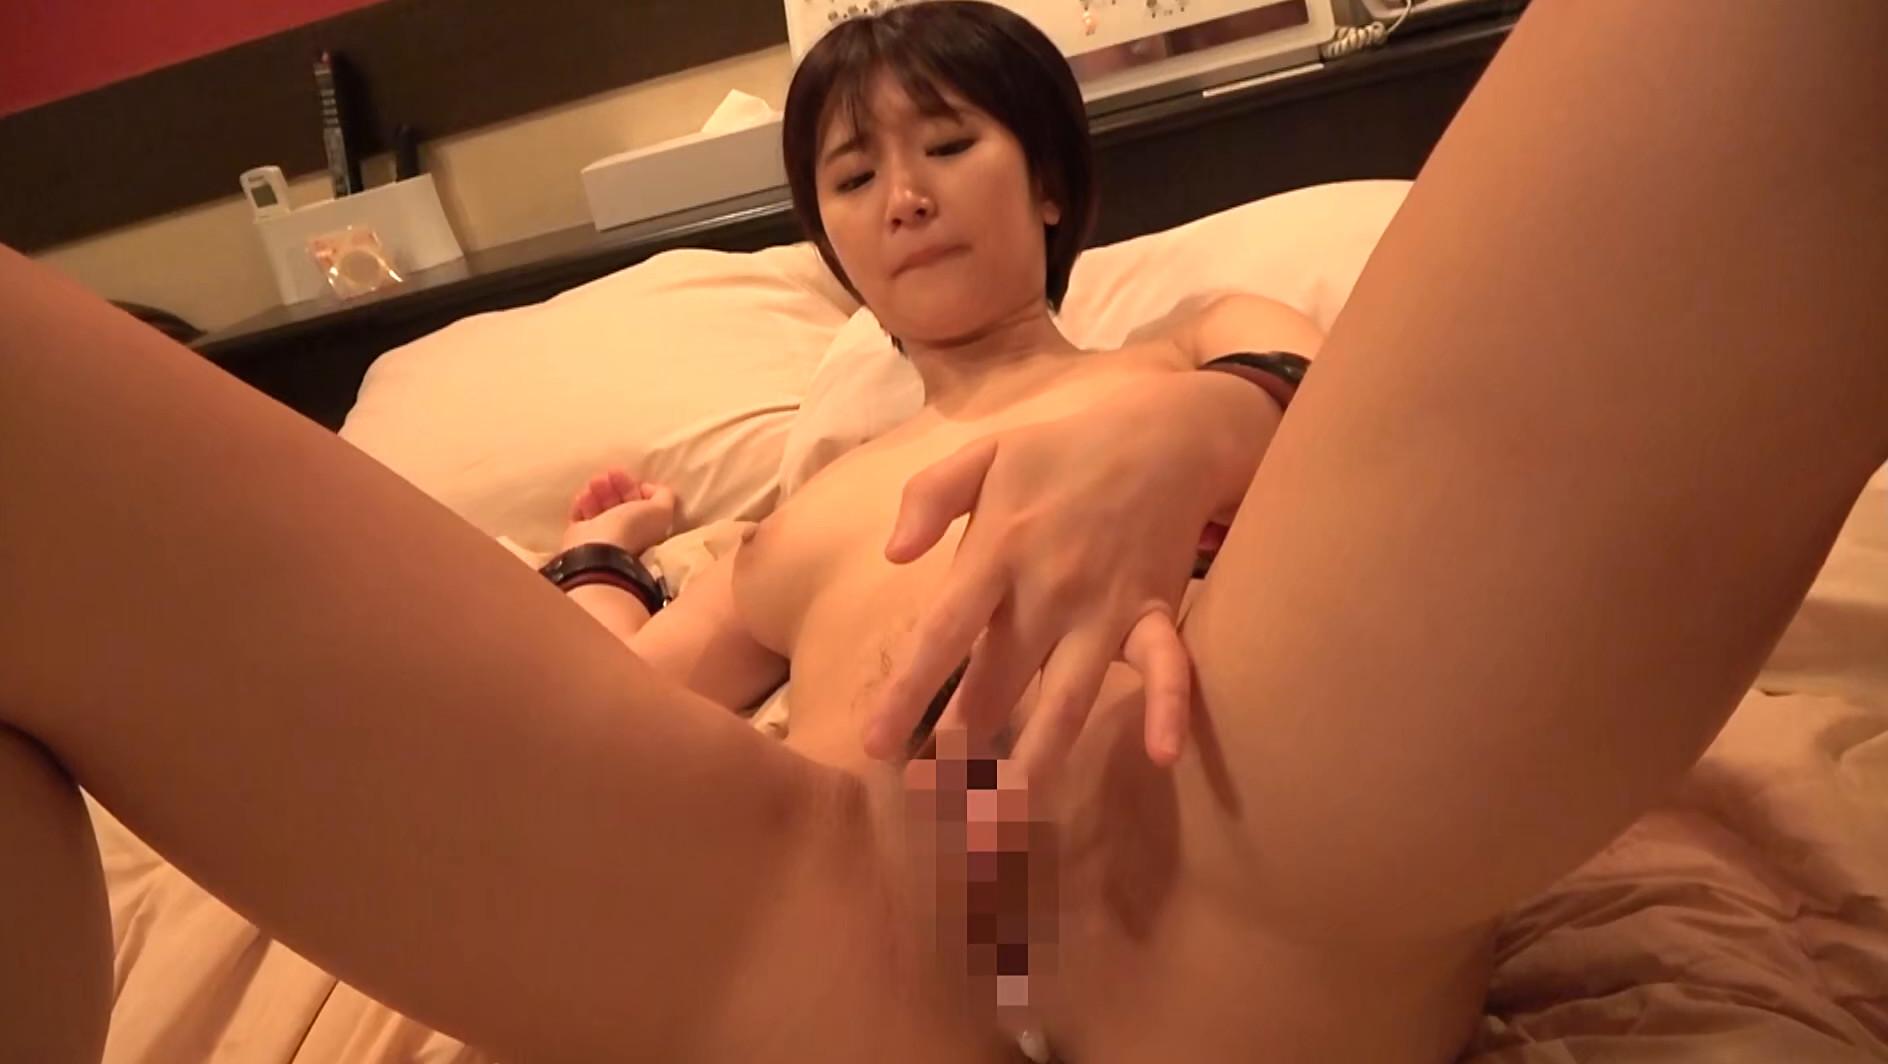 Fカップ巨乳女学生あっちゃんで女体盛りパフェ,のサンプル画像30